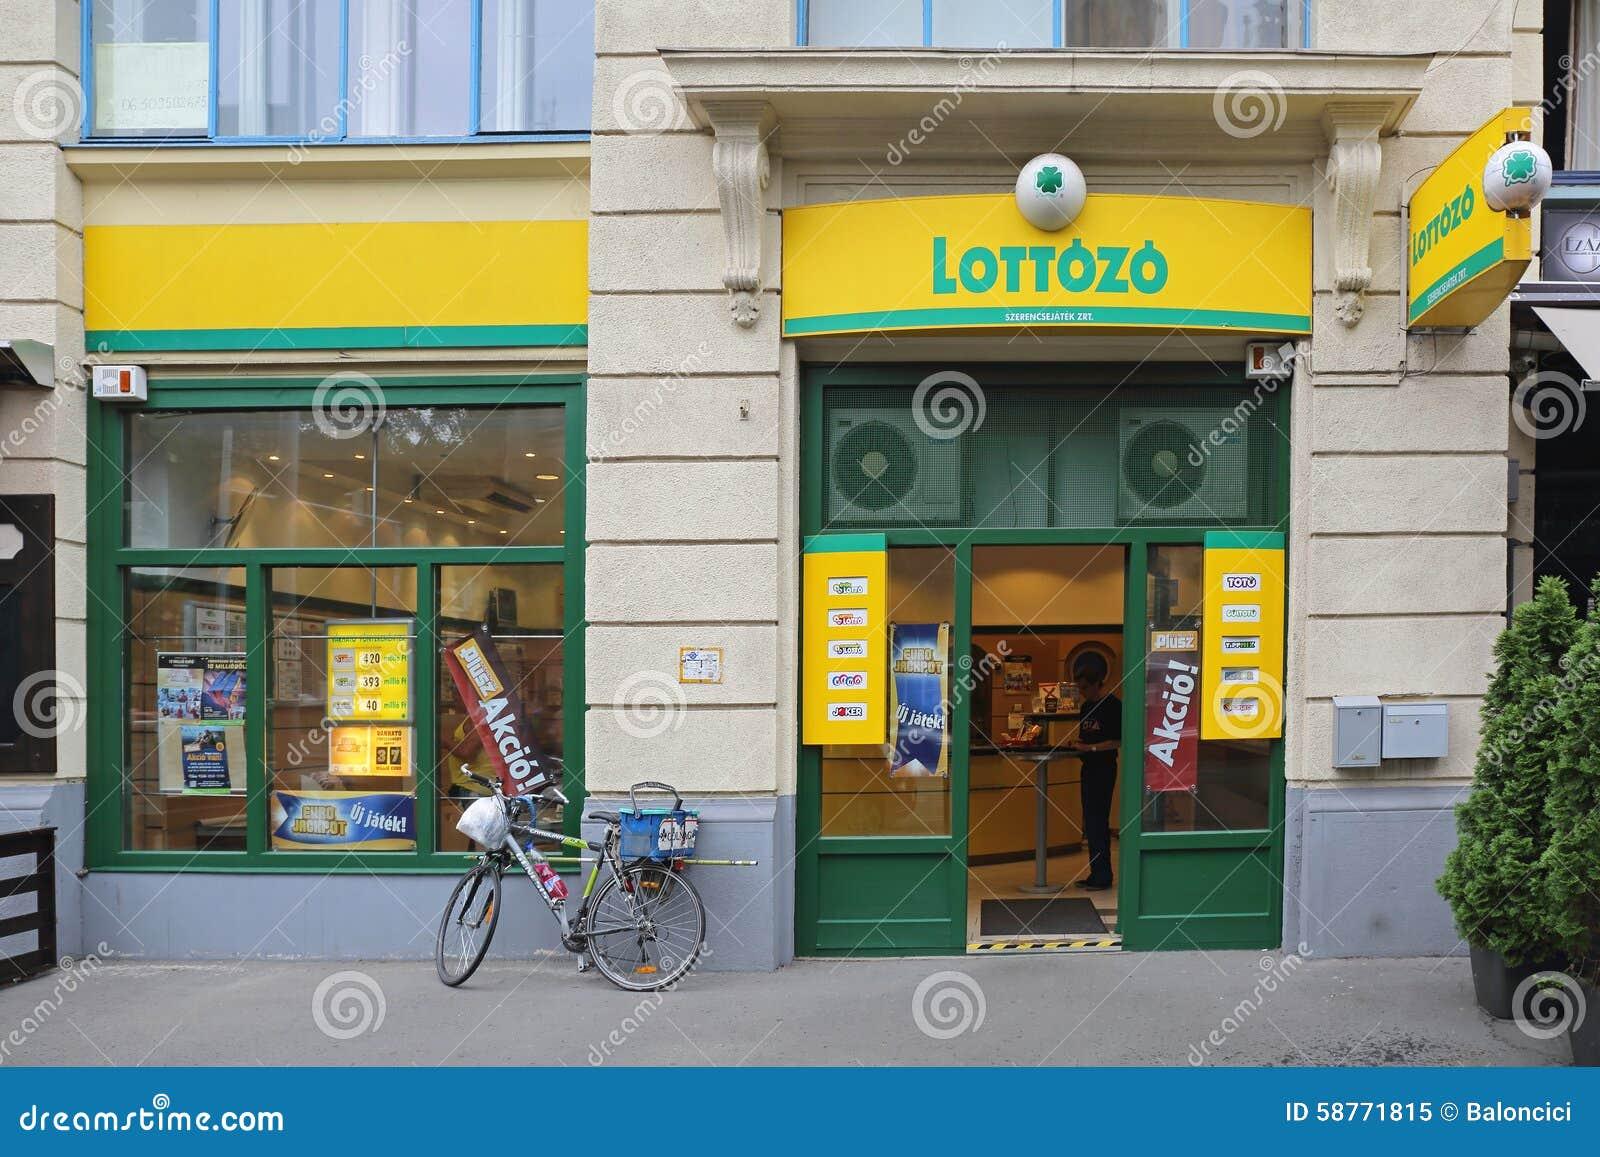 Hungarian Lottery - tslott, Hatoslott, Skandinv lott, Joker, Keno